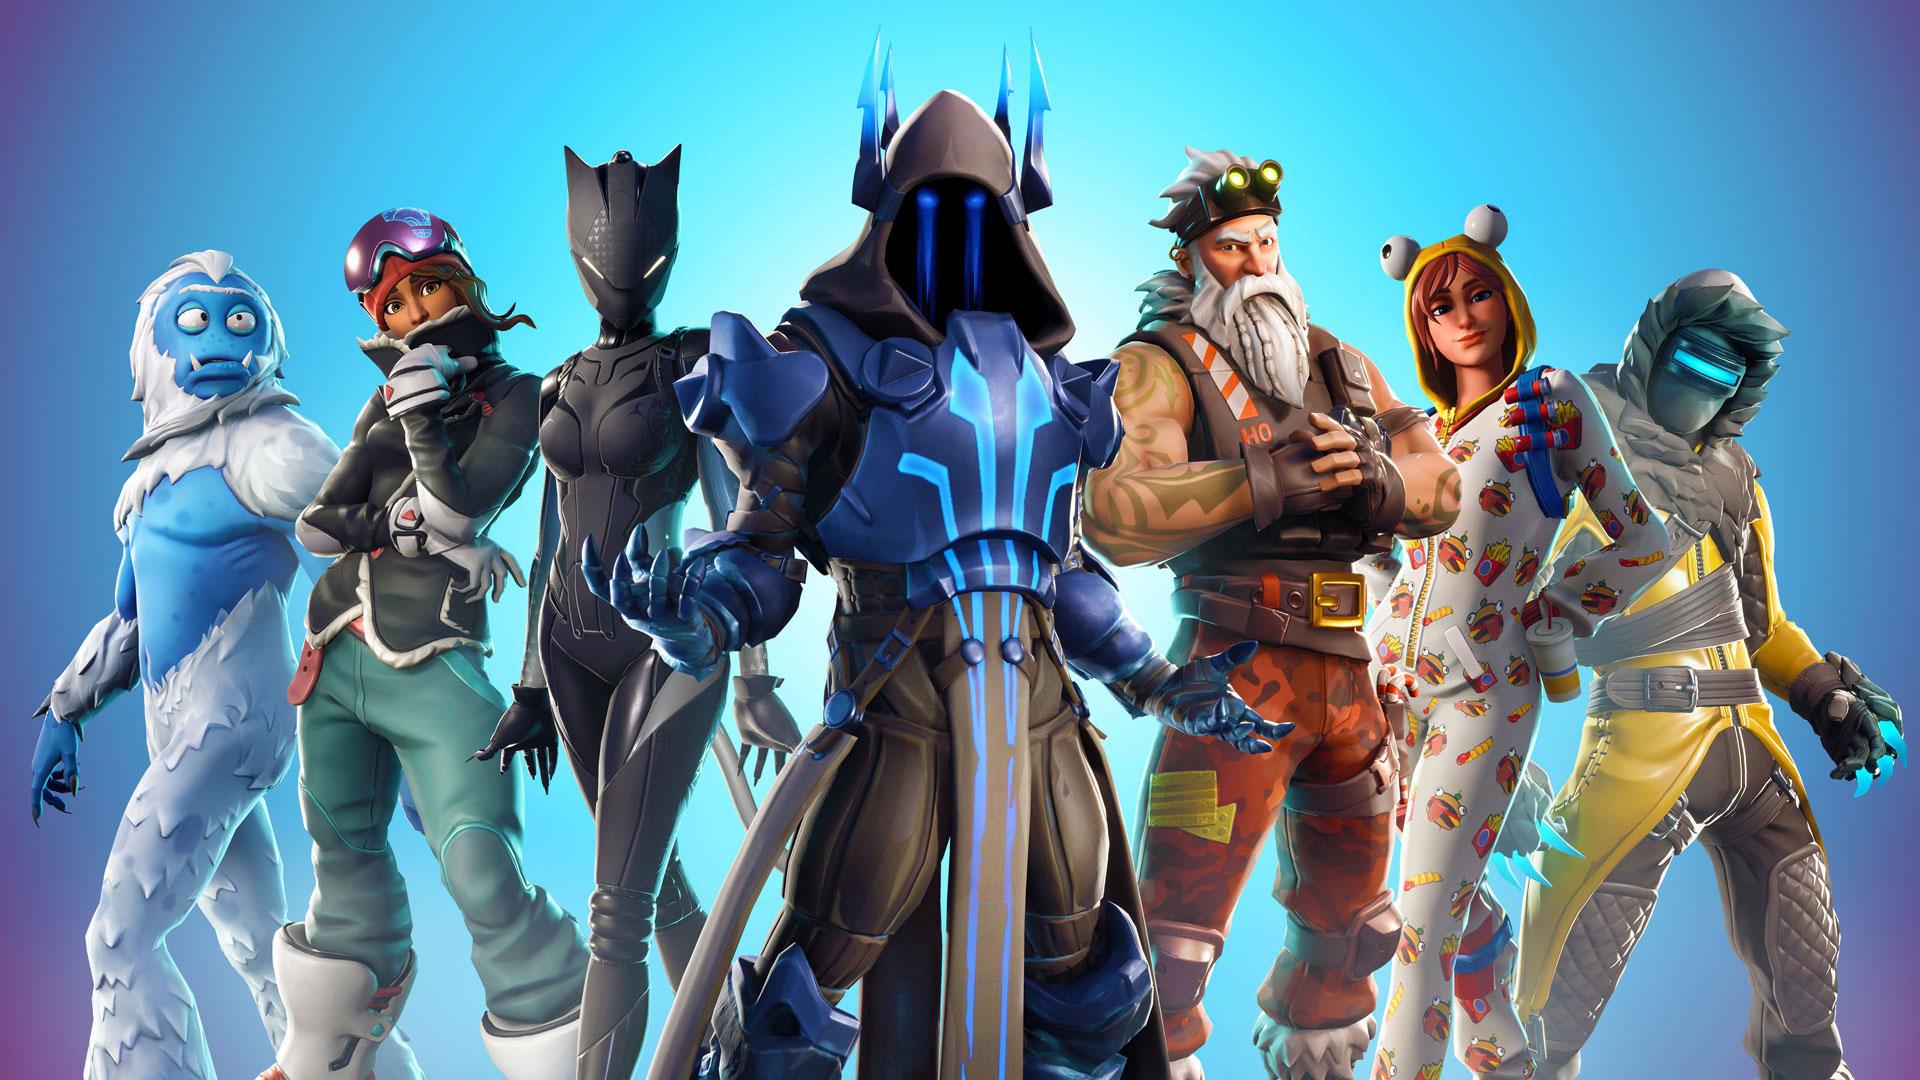 download wallpaper: Fortnite skins seizoen 7 wallpaper